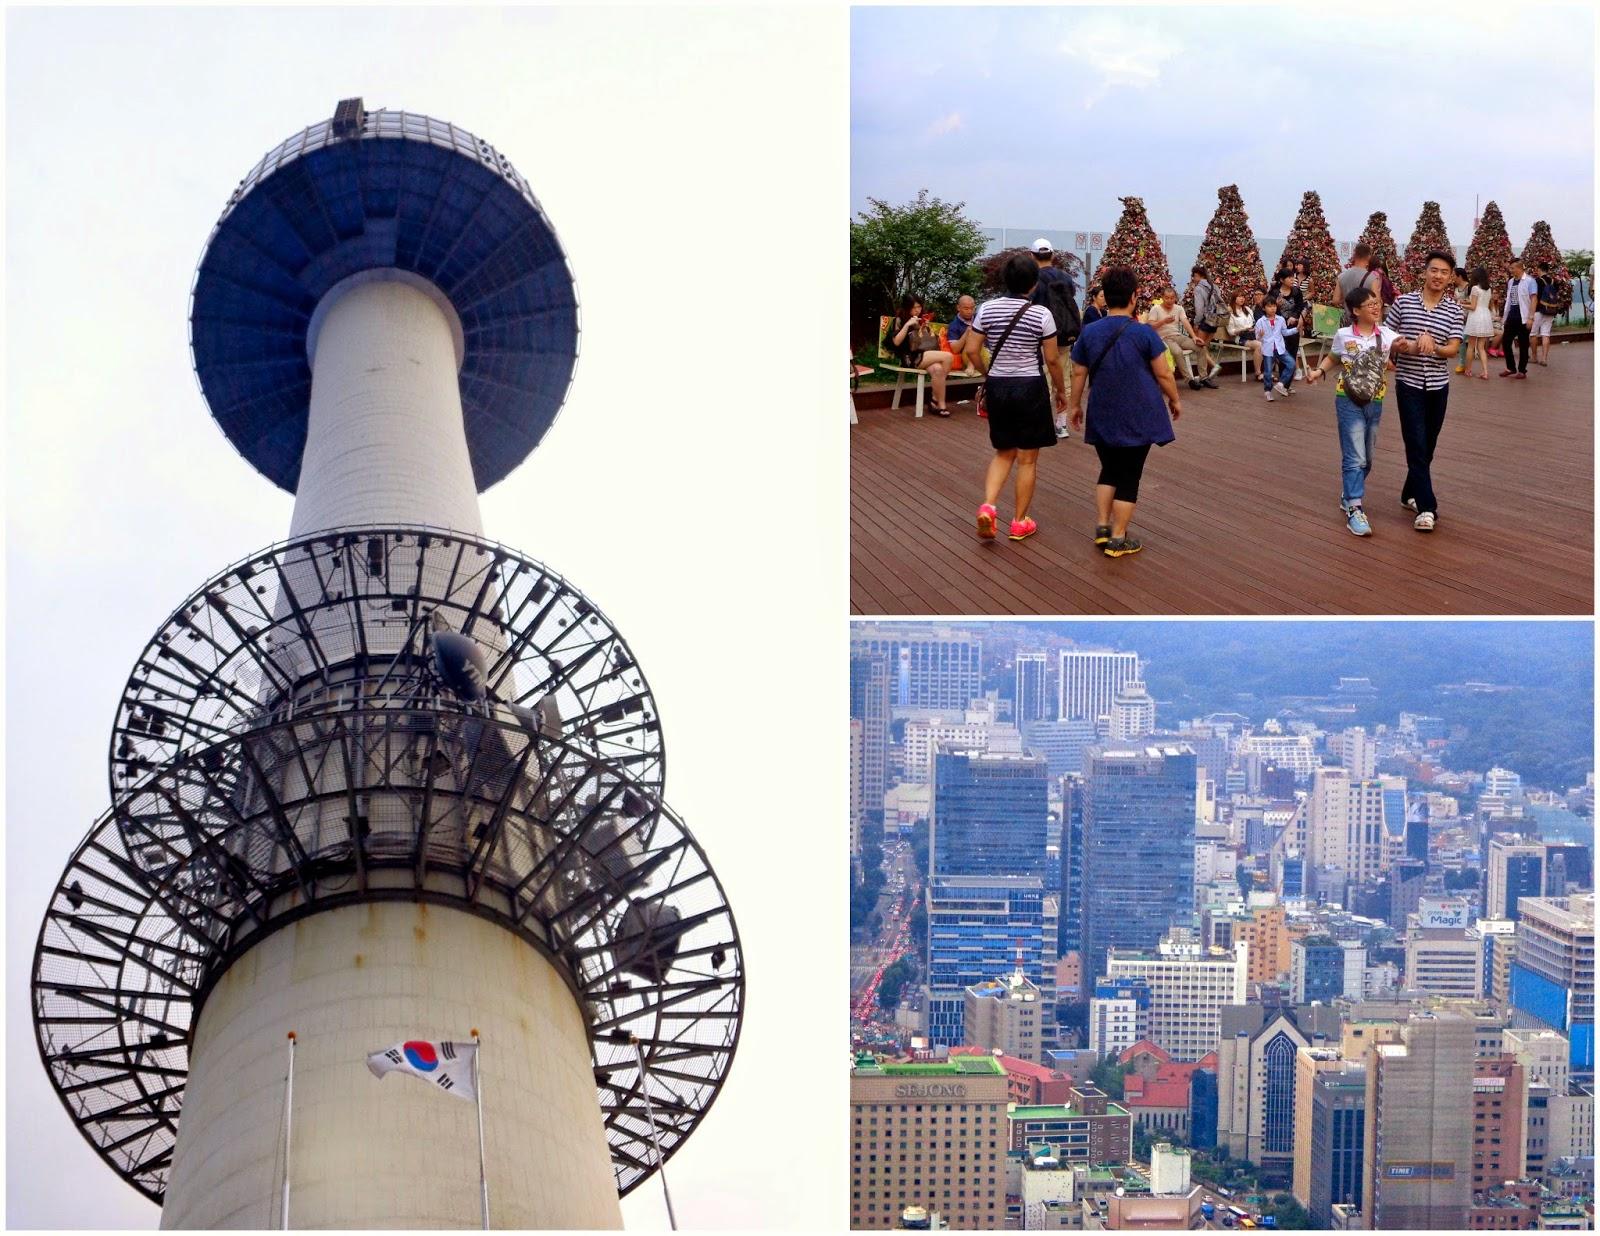 N Seoul Tower (Namsan Tower)